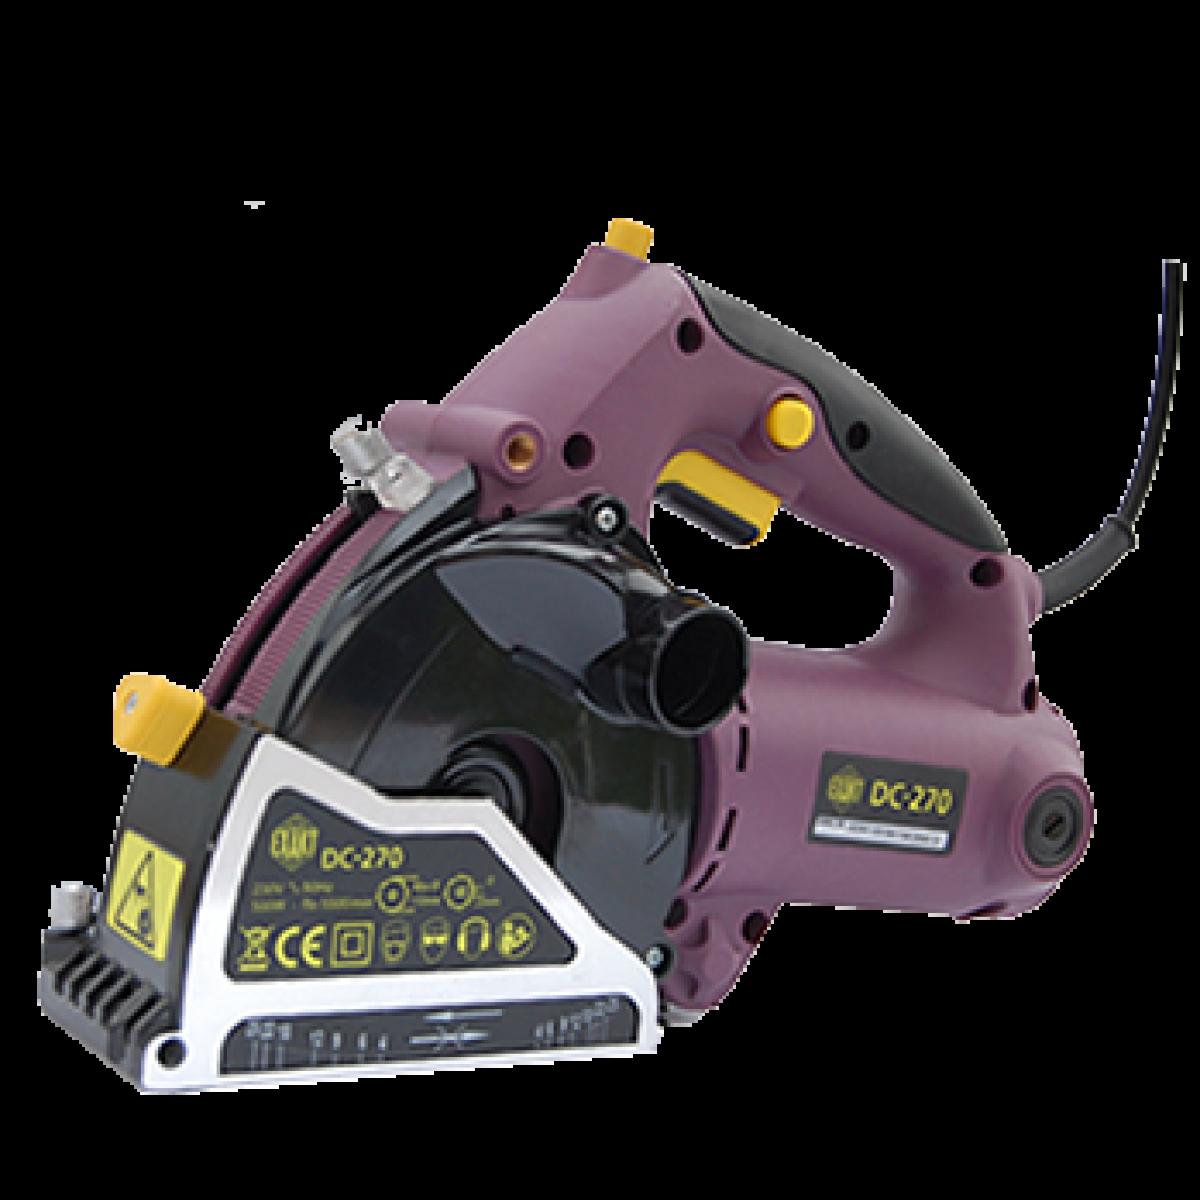 Exakt Saw Model Dc280